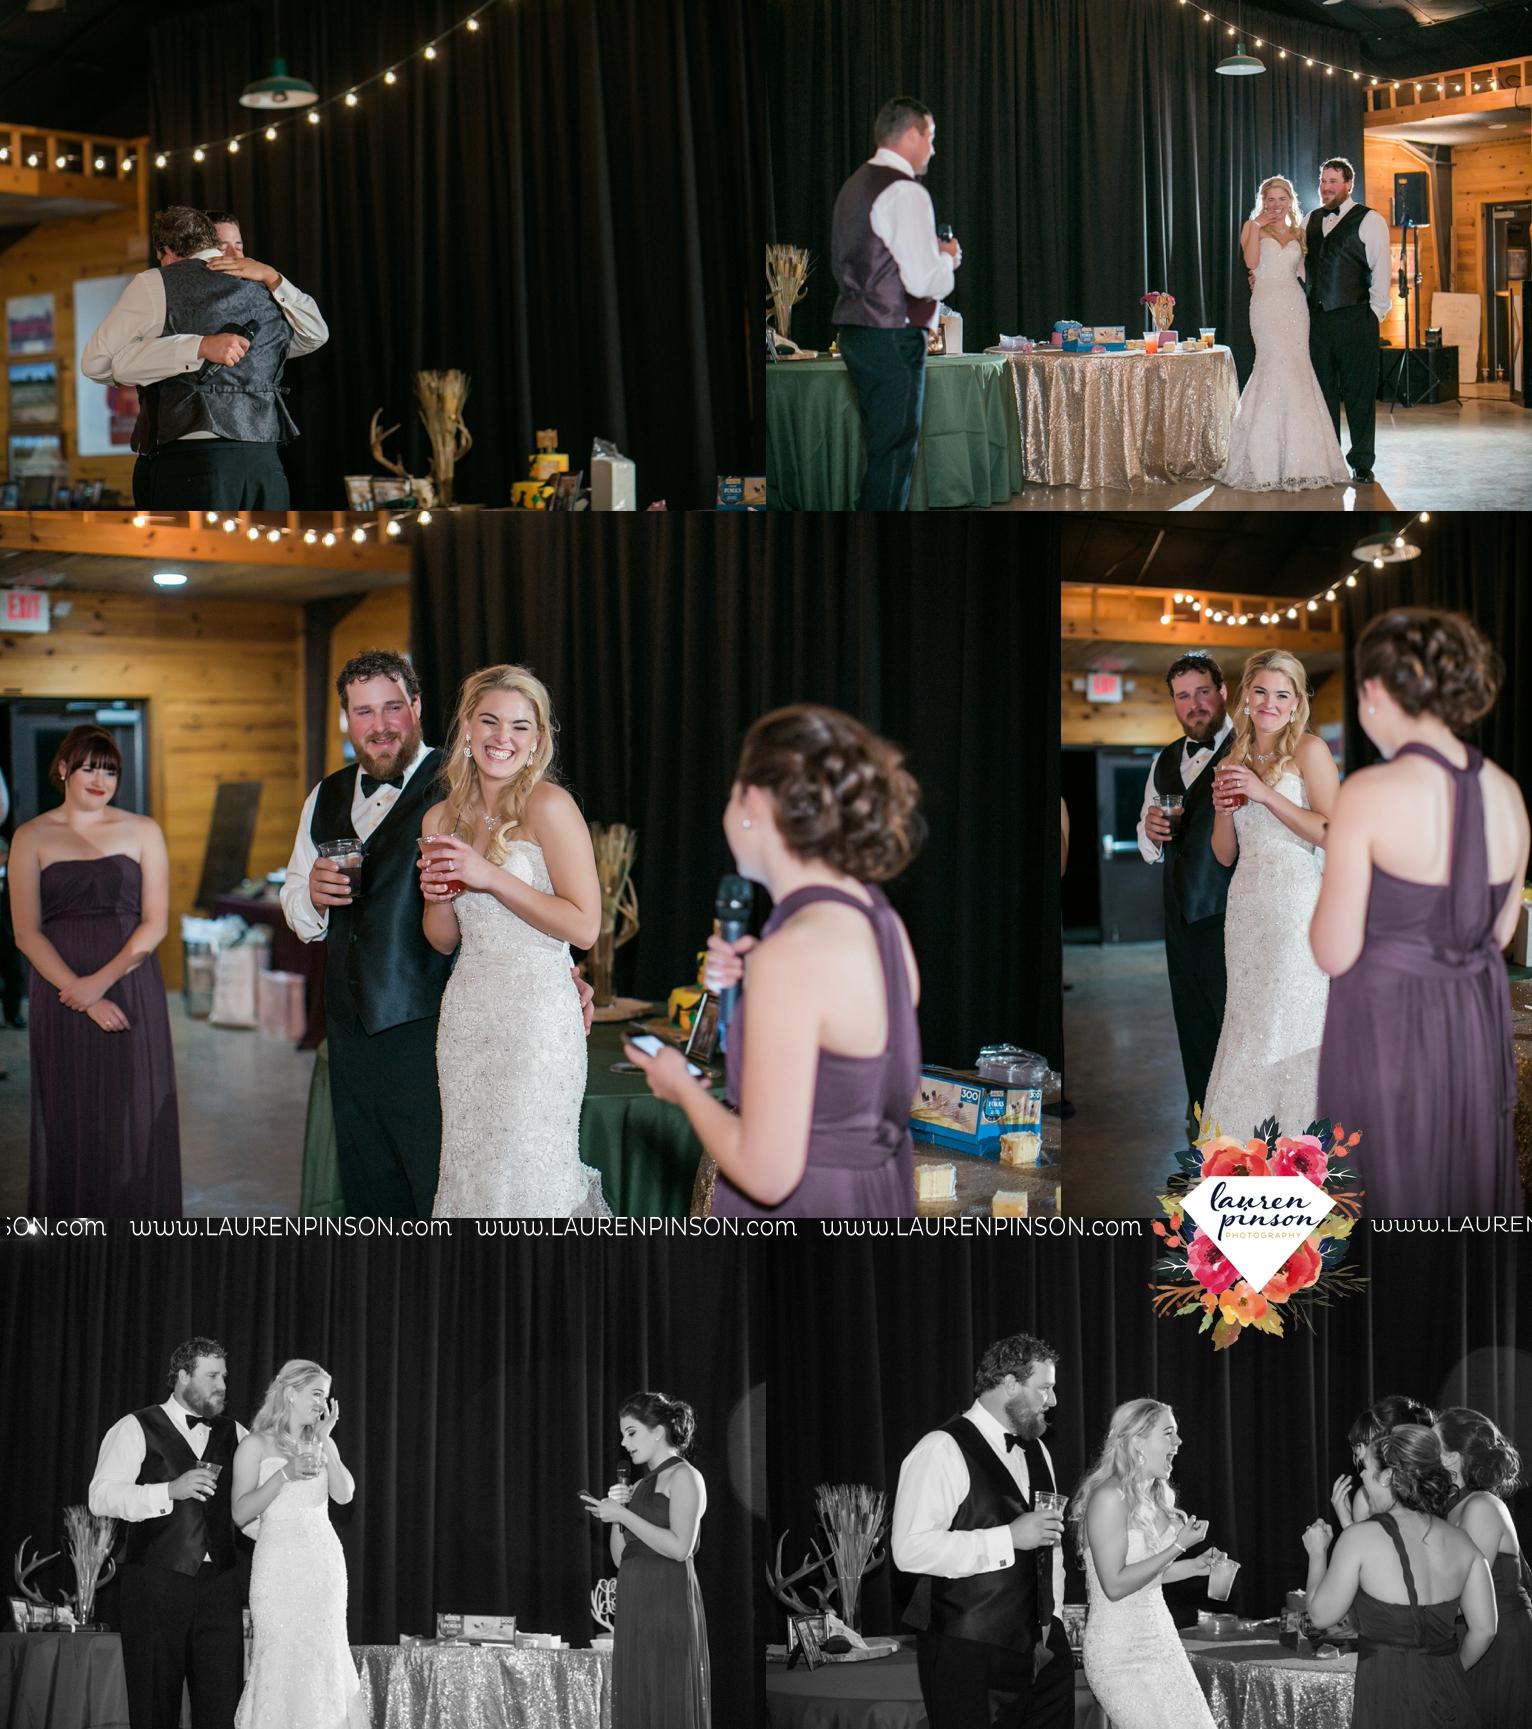 rustic-wichita-falls-texas-wedding-photographer-gold-glam-mayfield-events-market-street-united-allue-bridals-fall_1781.jpg